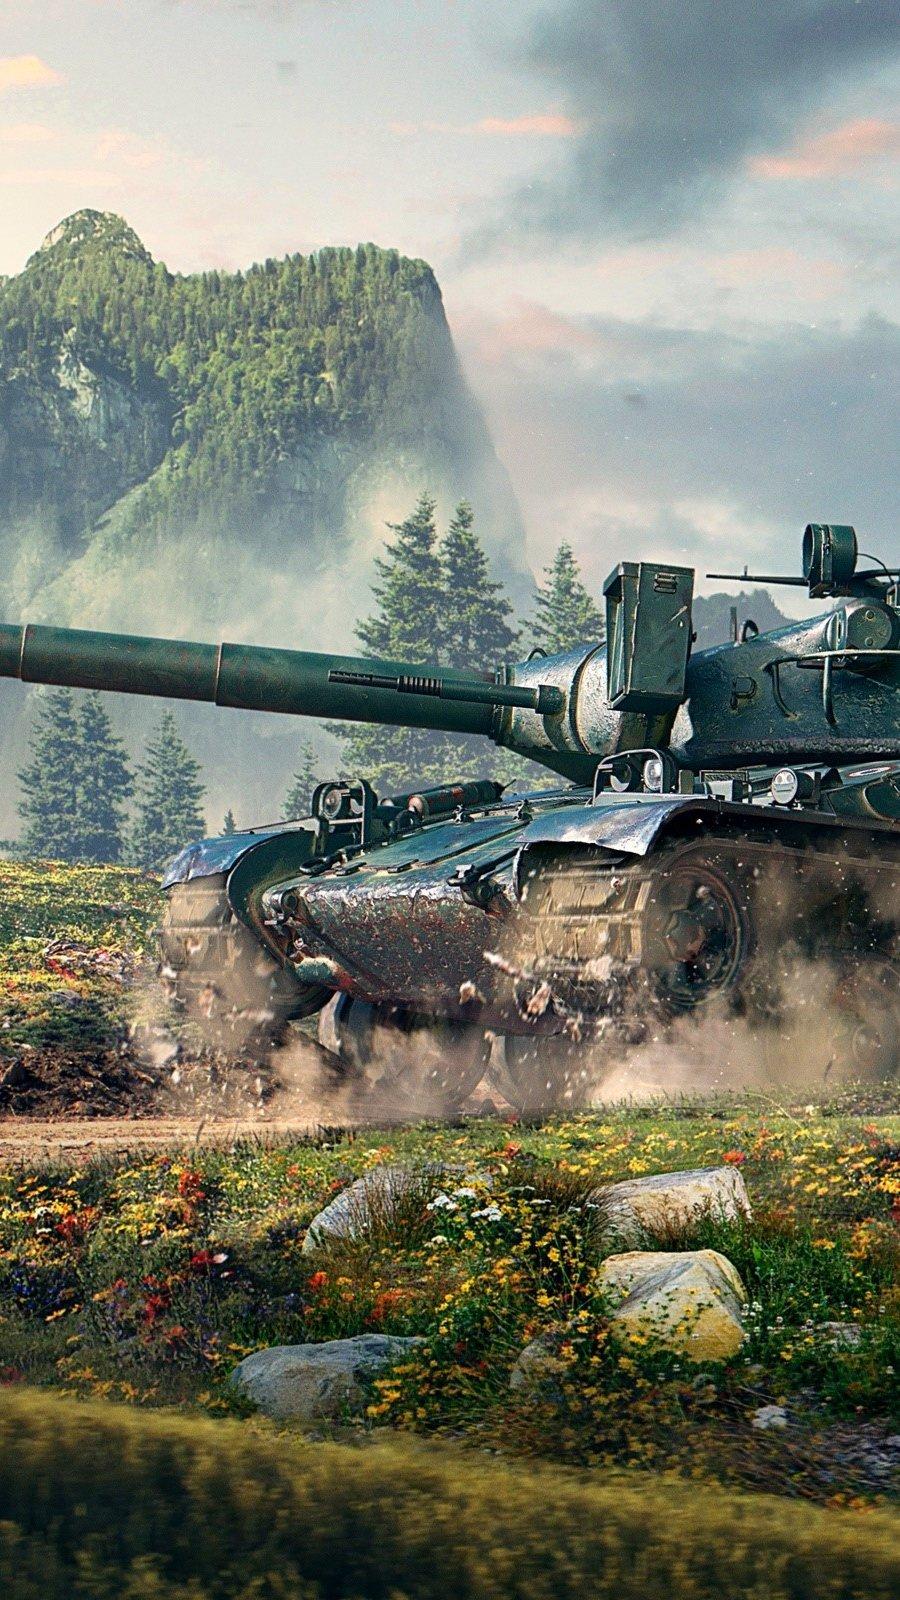 Wallpaper AMX 30 World of tanks Vertical